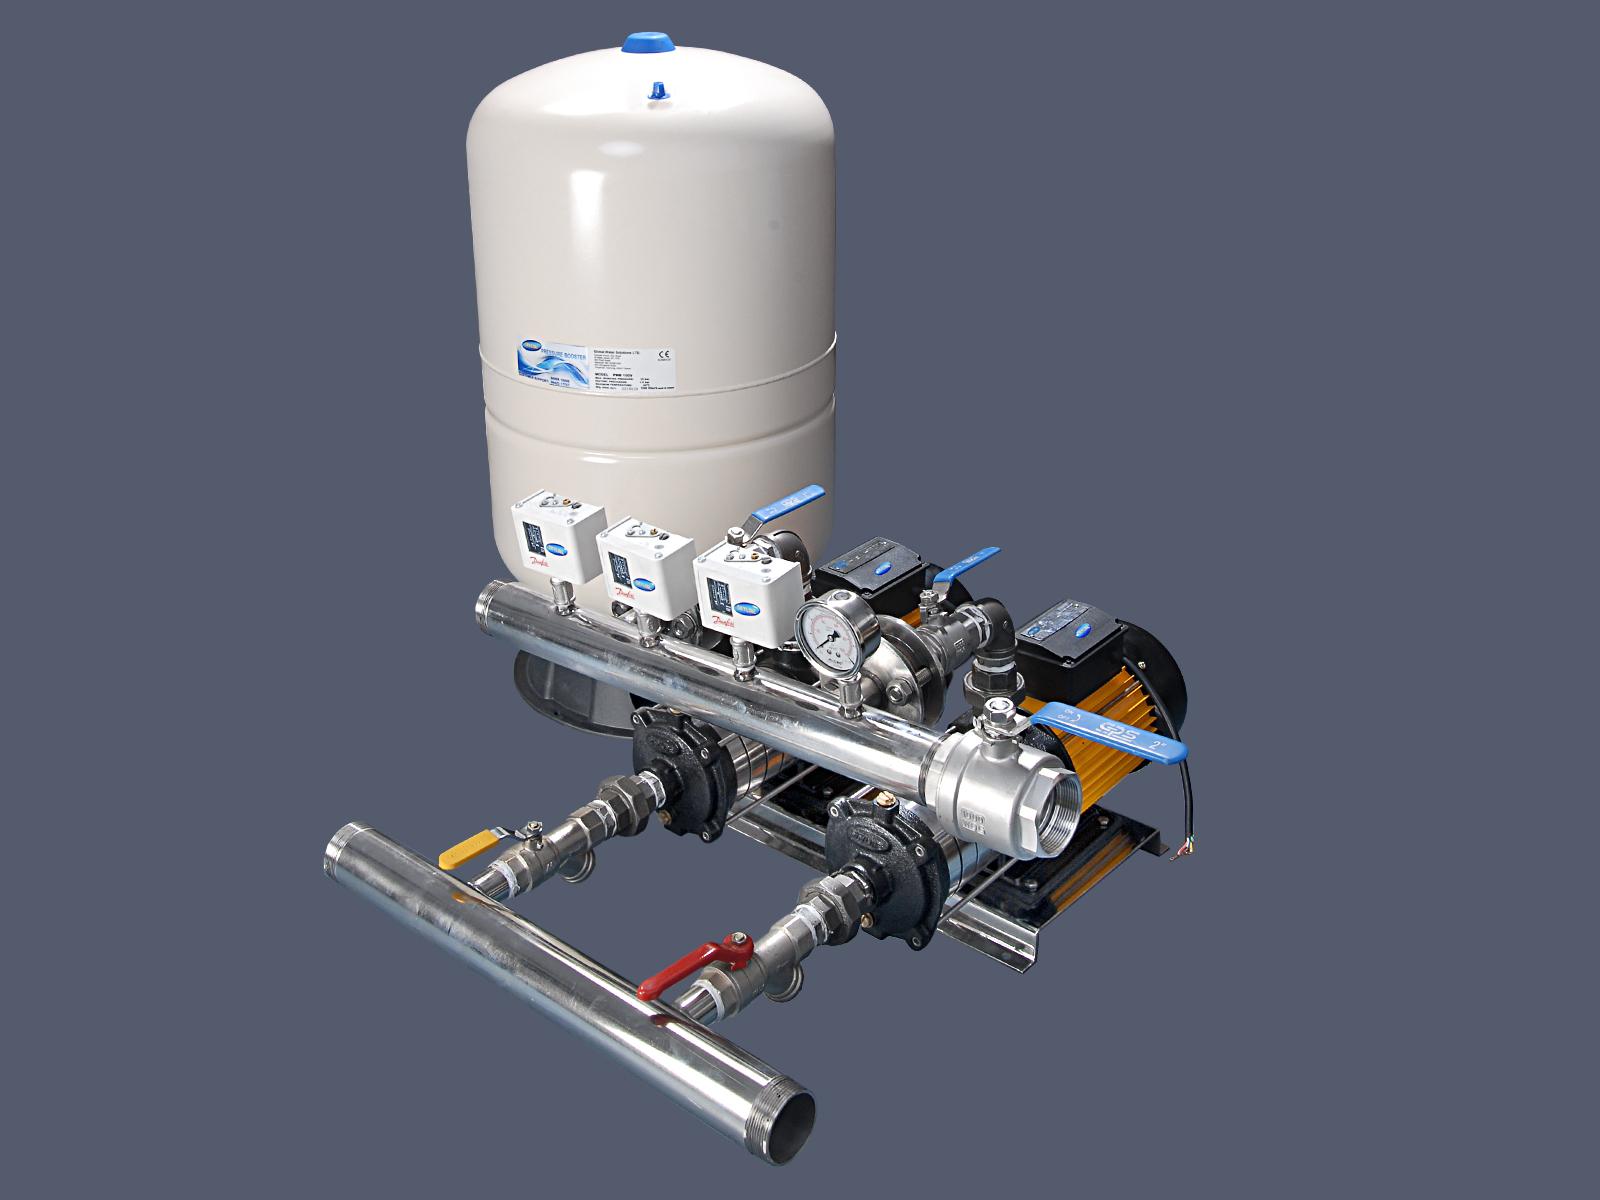 Pressure Booster Pumps Manufacturers In Karur